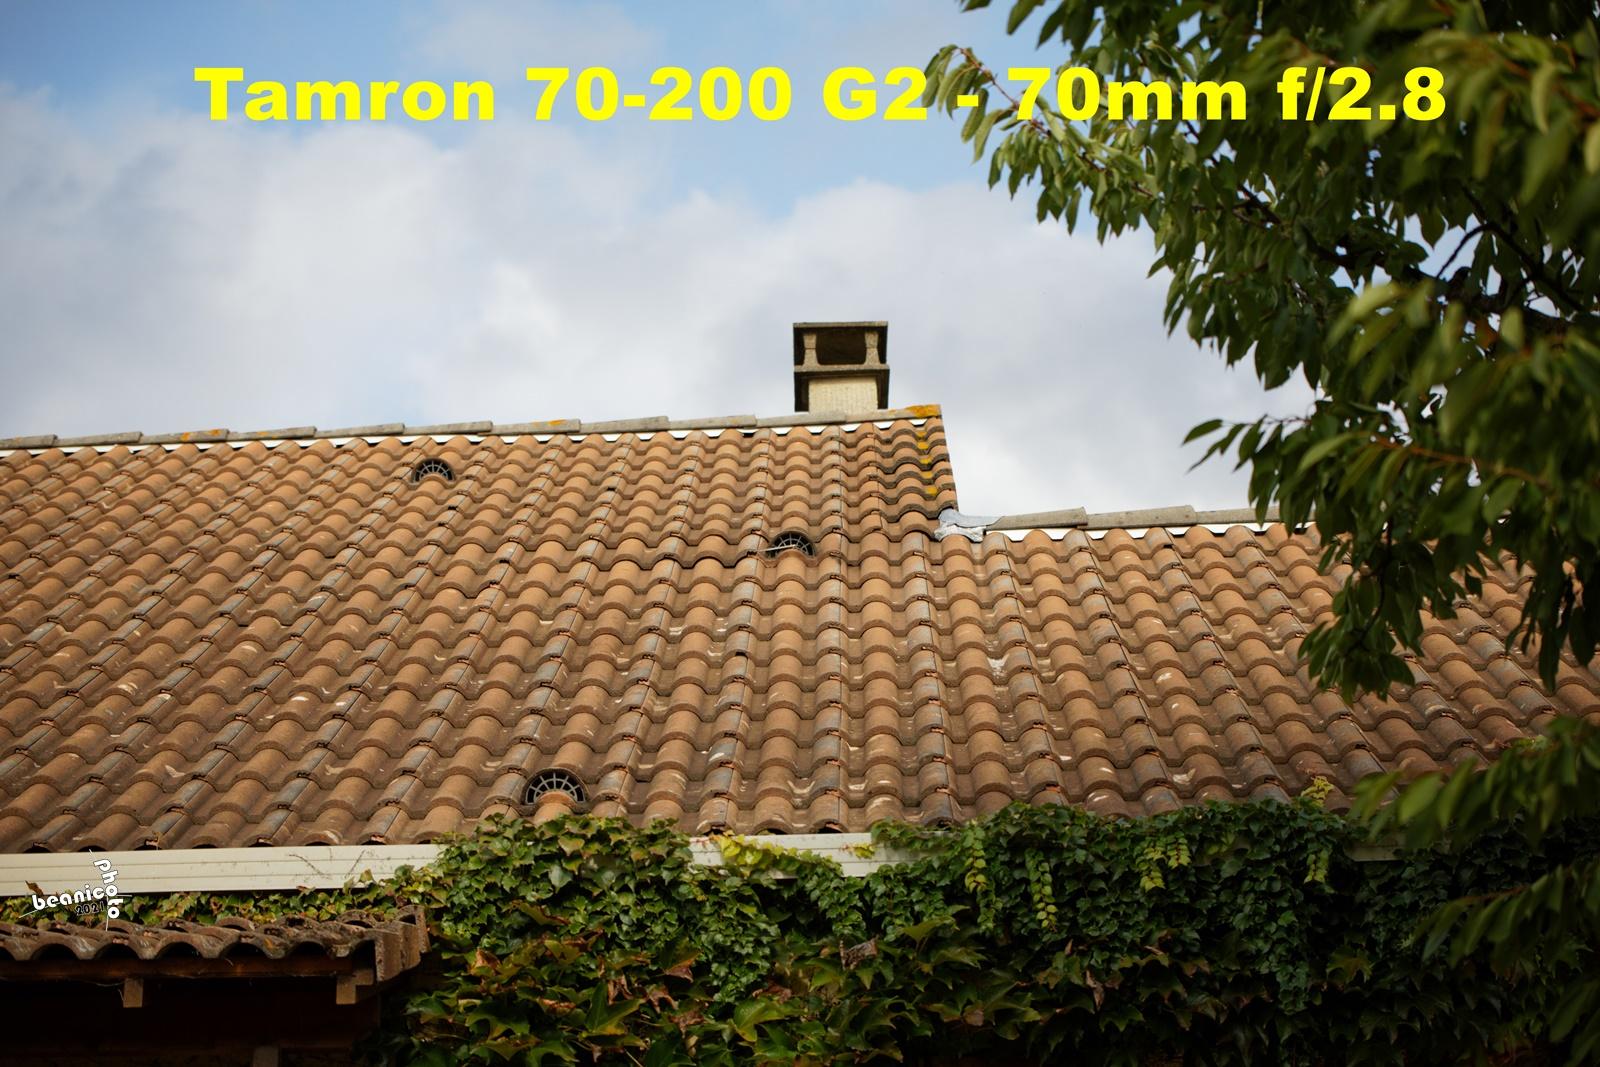 www.beanico-photo.fr - Tamron 70-200mm f/2.8 VC USD G2